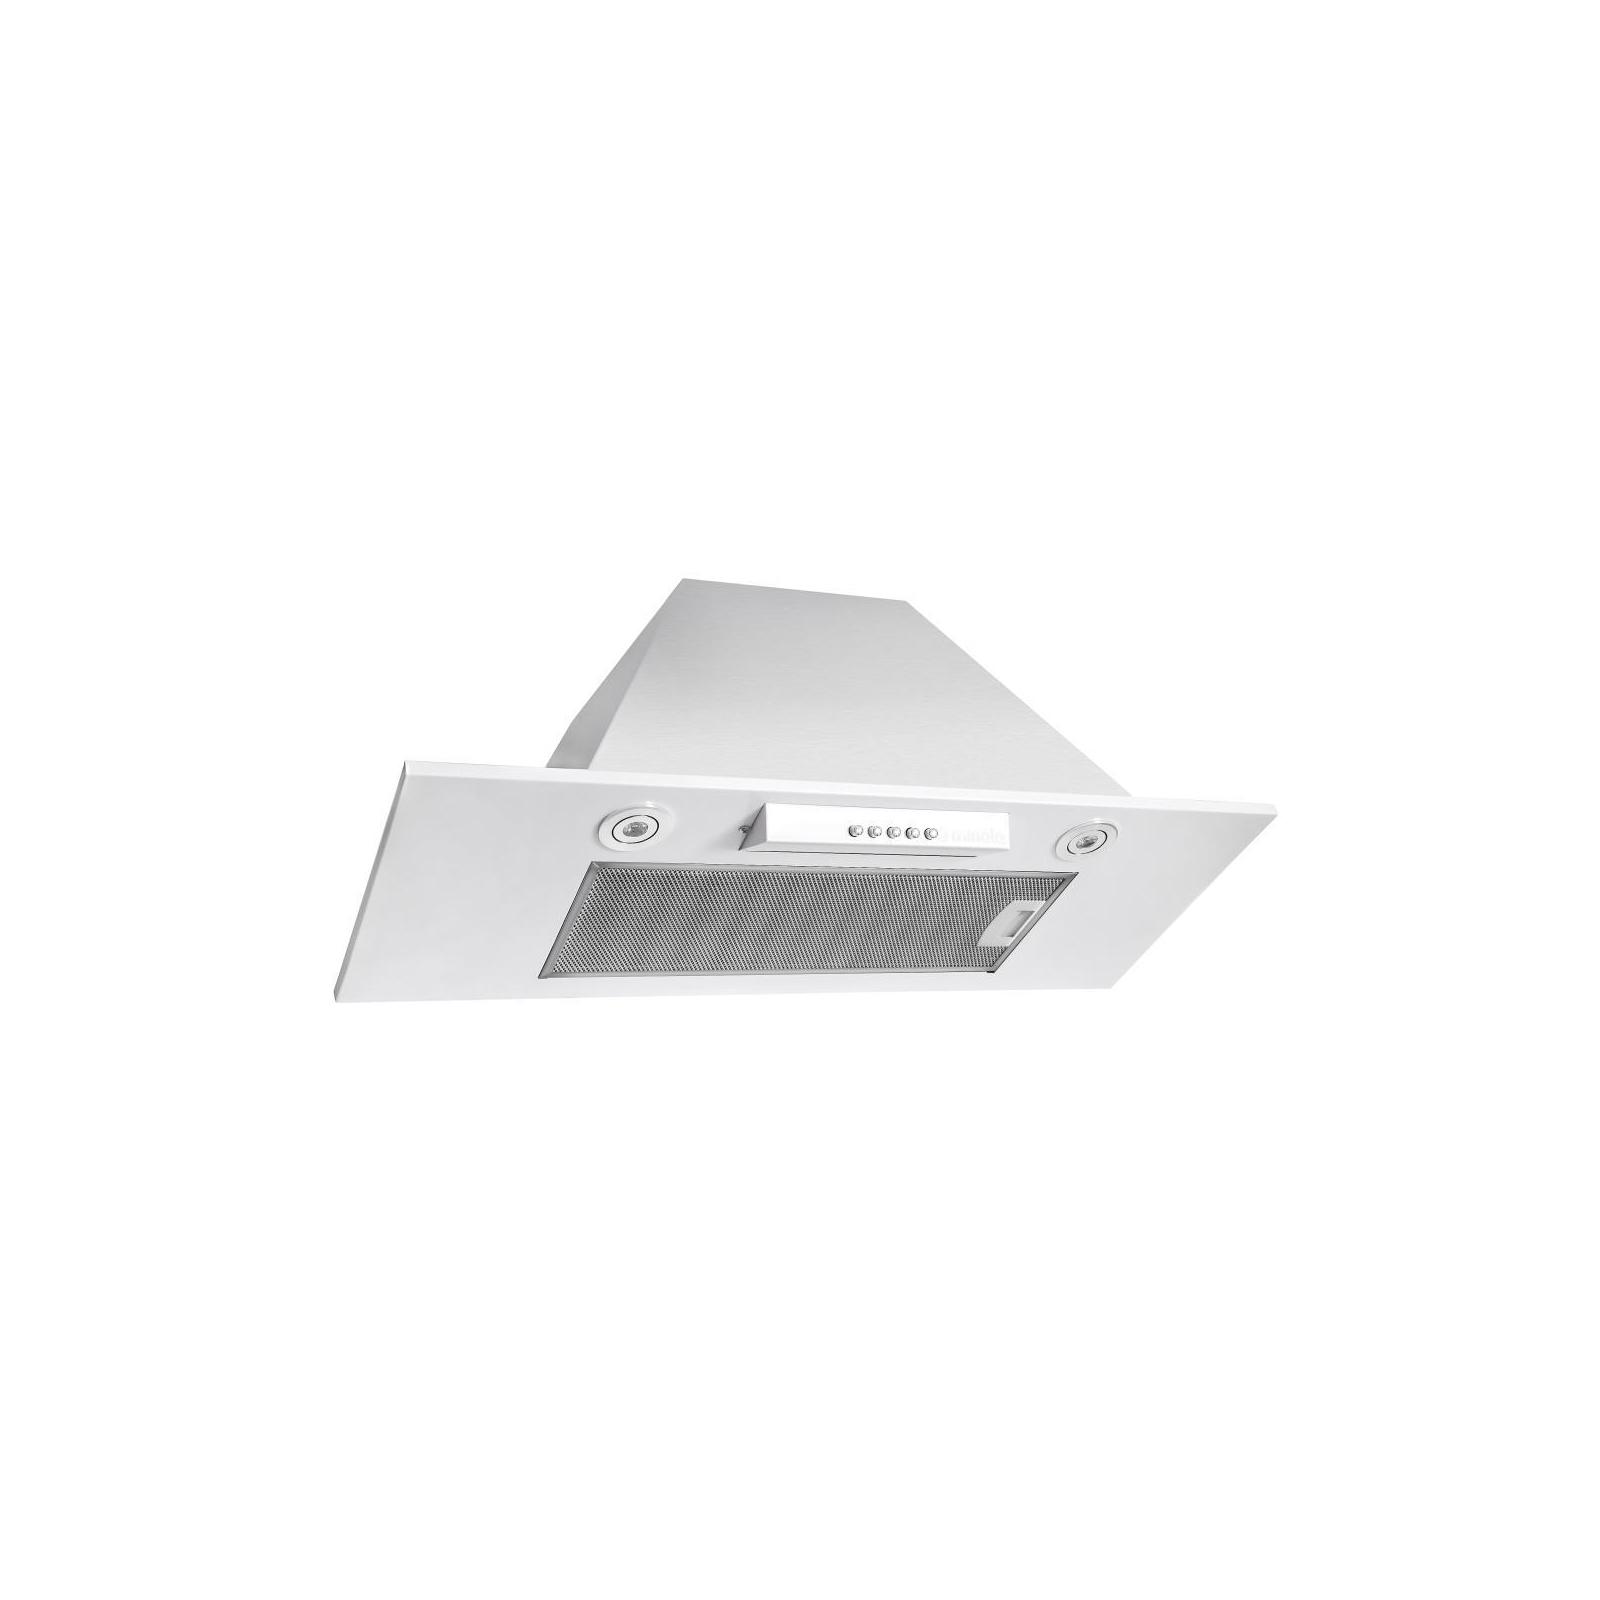 Вытяжка кухонная MINOLA HBI 7312 WH LED 750